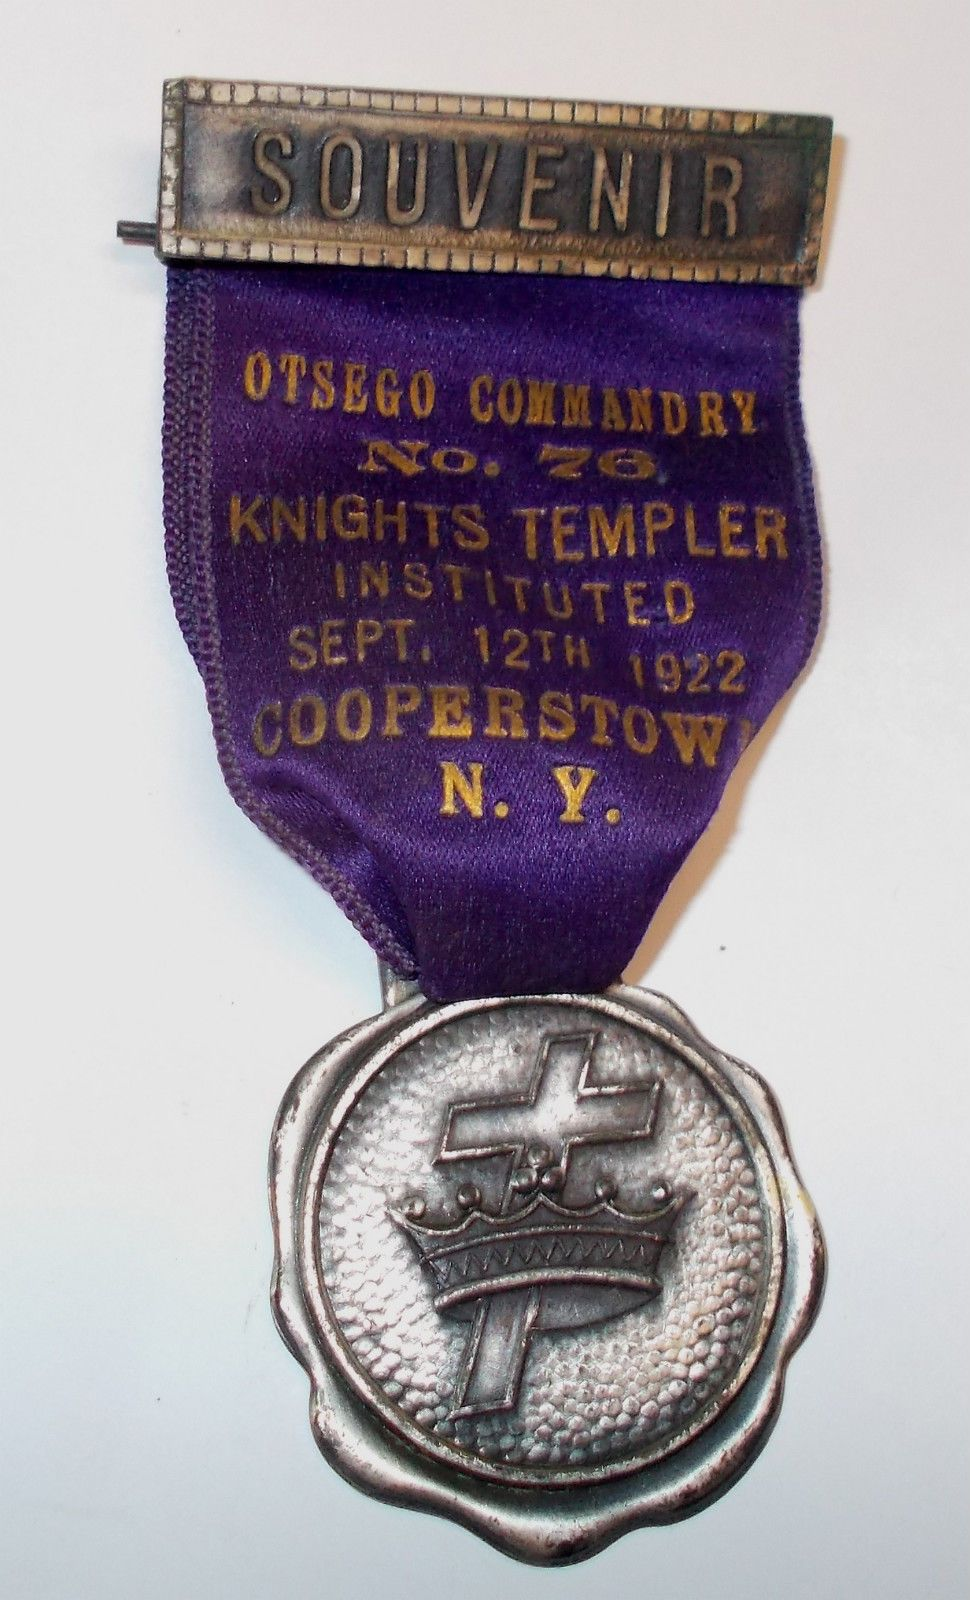 Vintage 1922 Knights Templer Otsego Commandry Souvenir Ribbon Medal | eBay